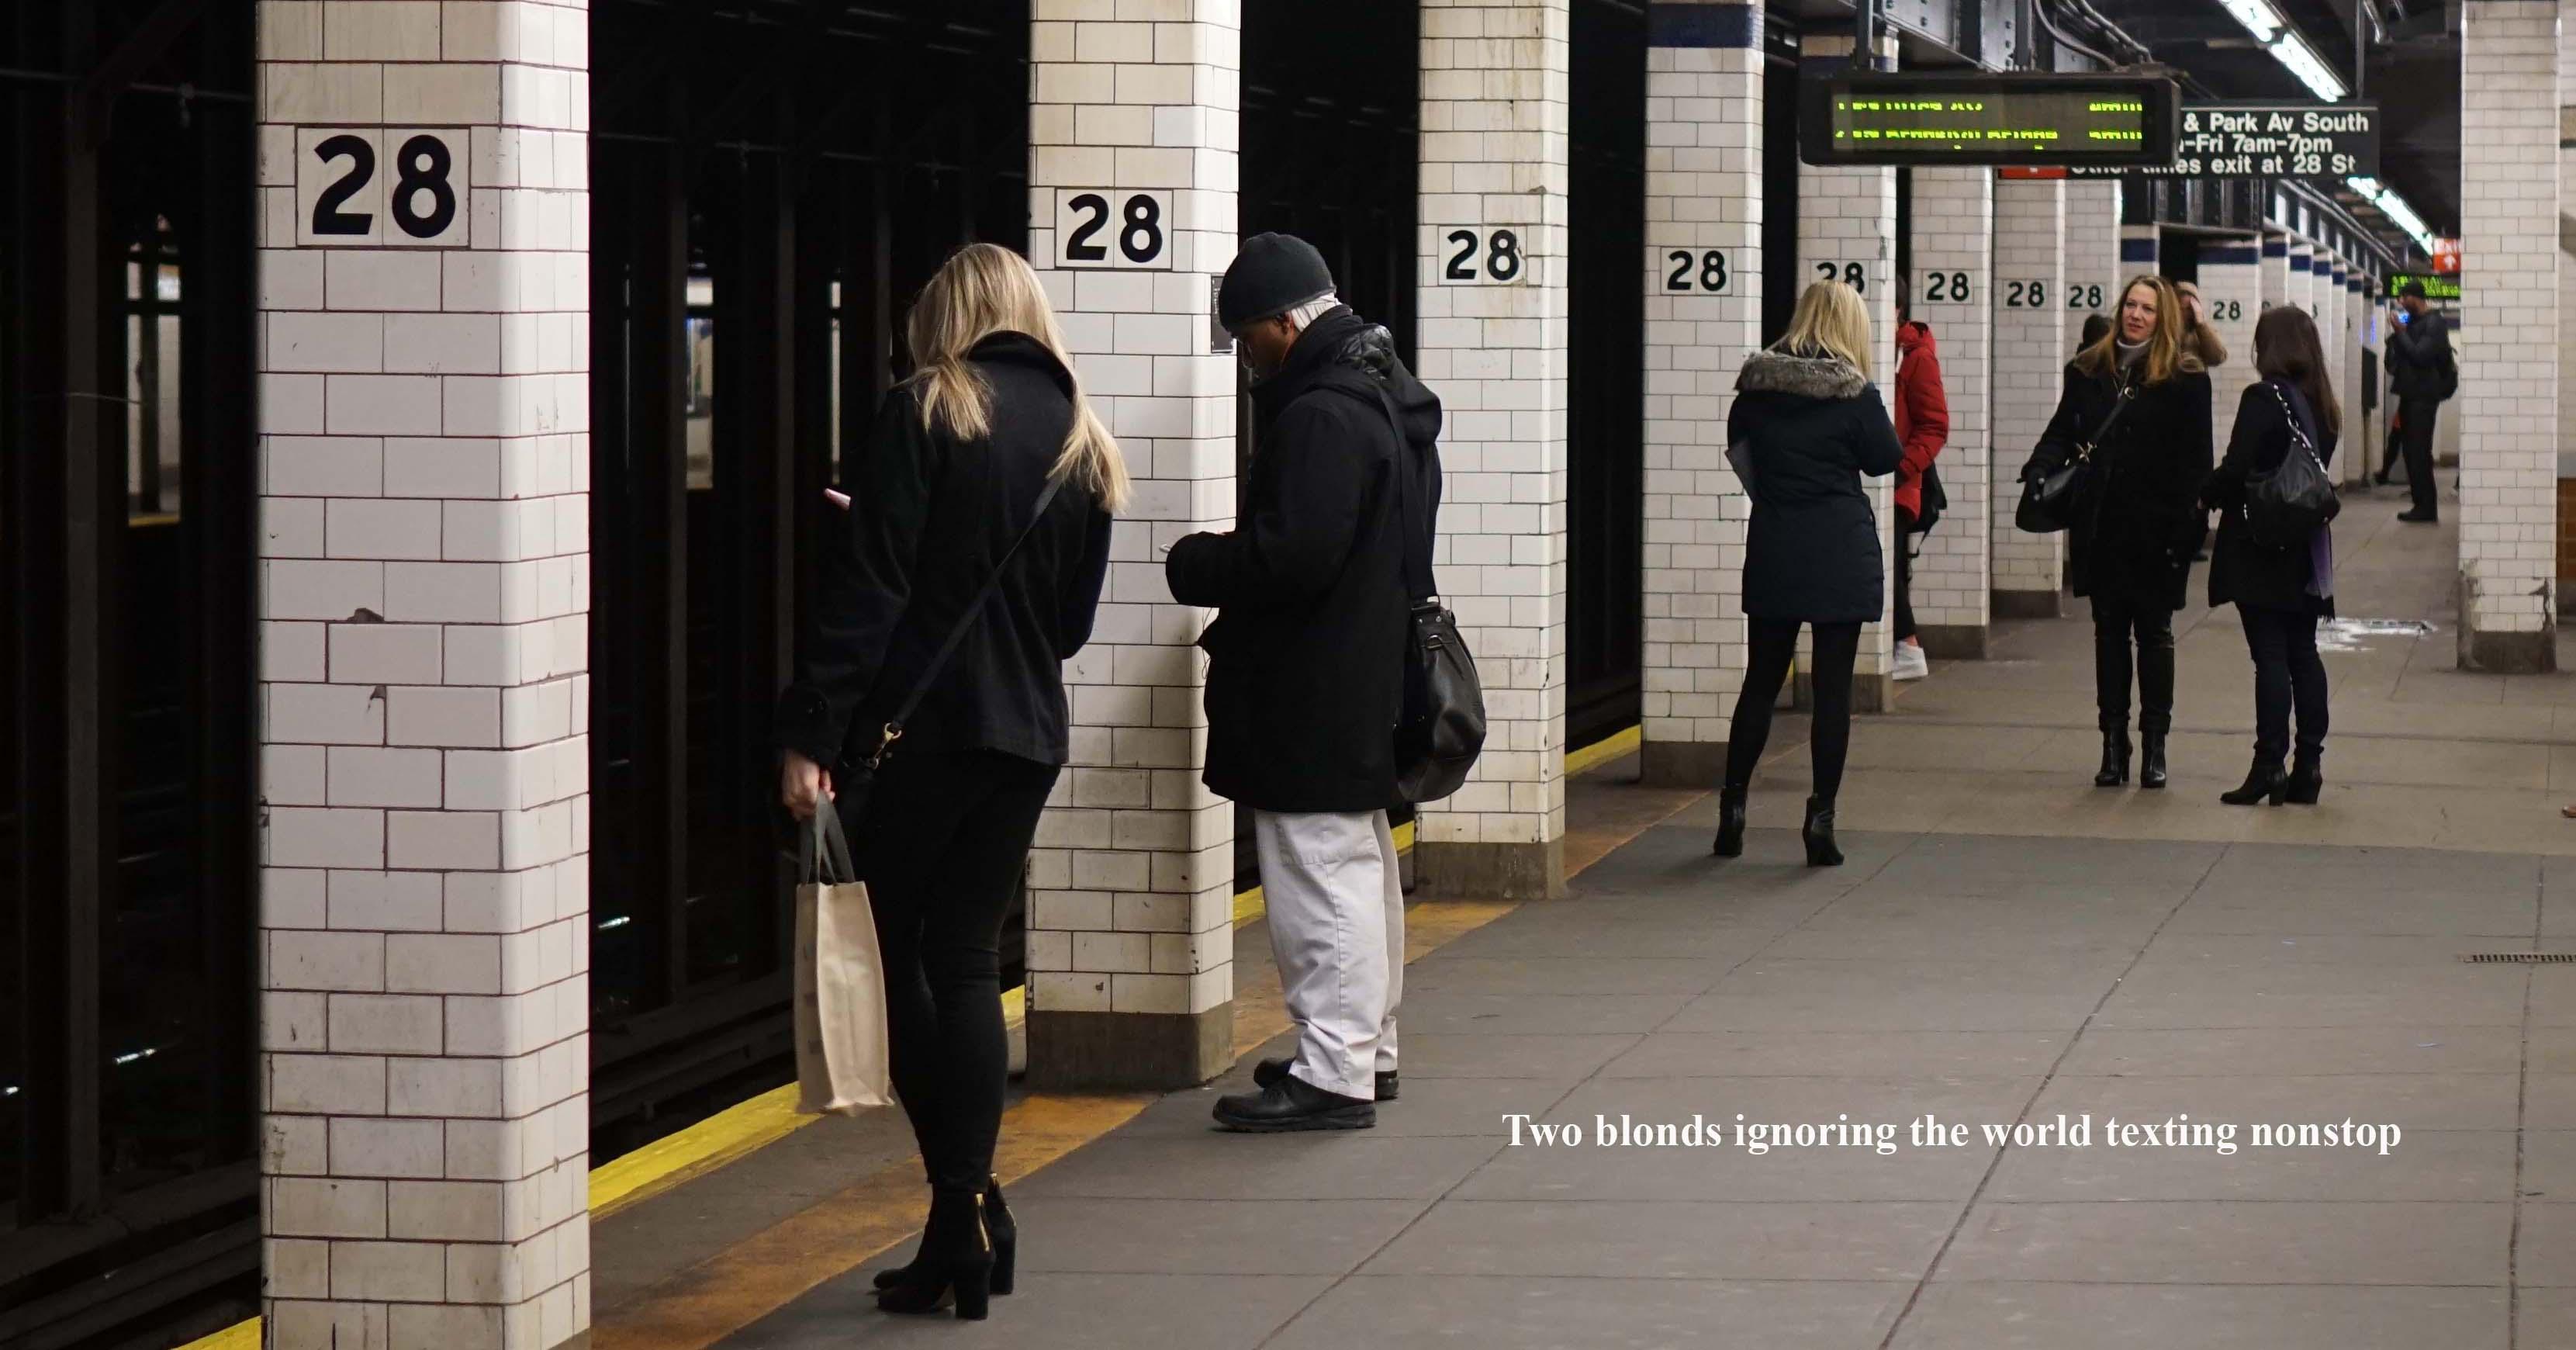 Chicks on subway platform texting